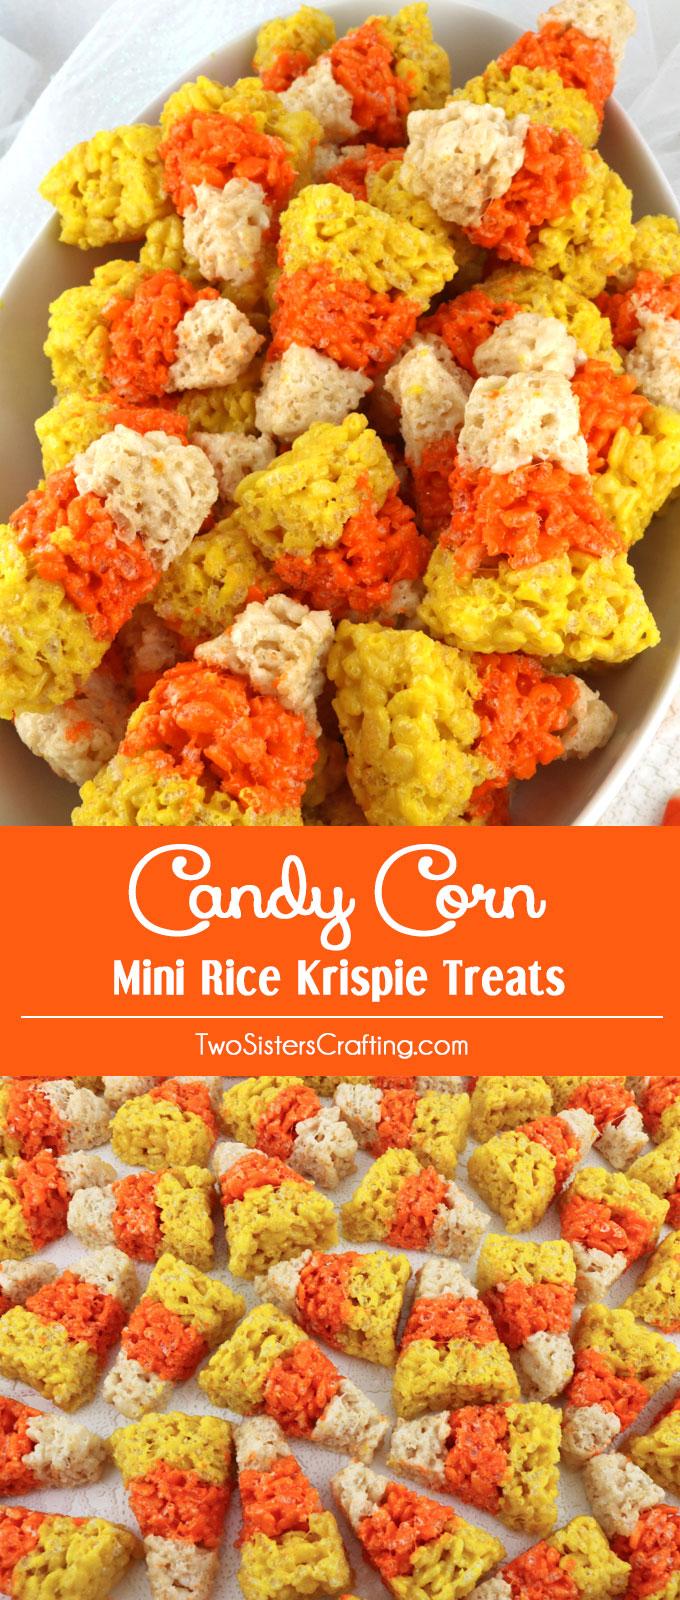 Candy Corn Mini Rice Krispie Treats - Two Sisters